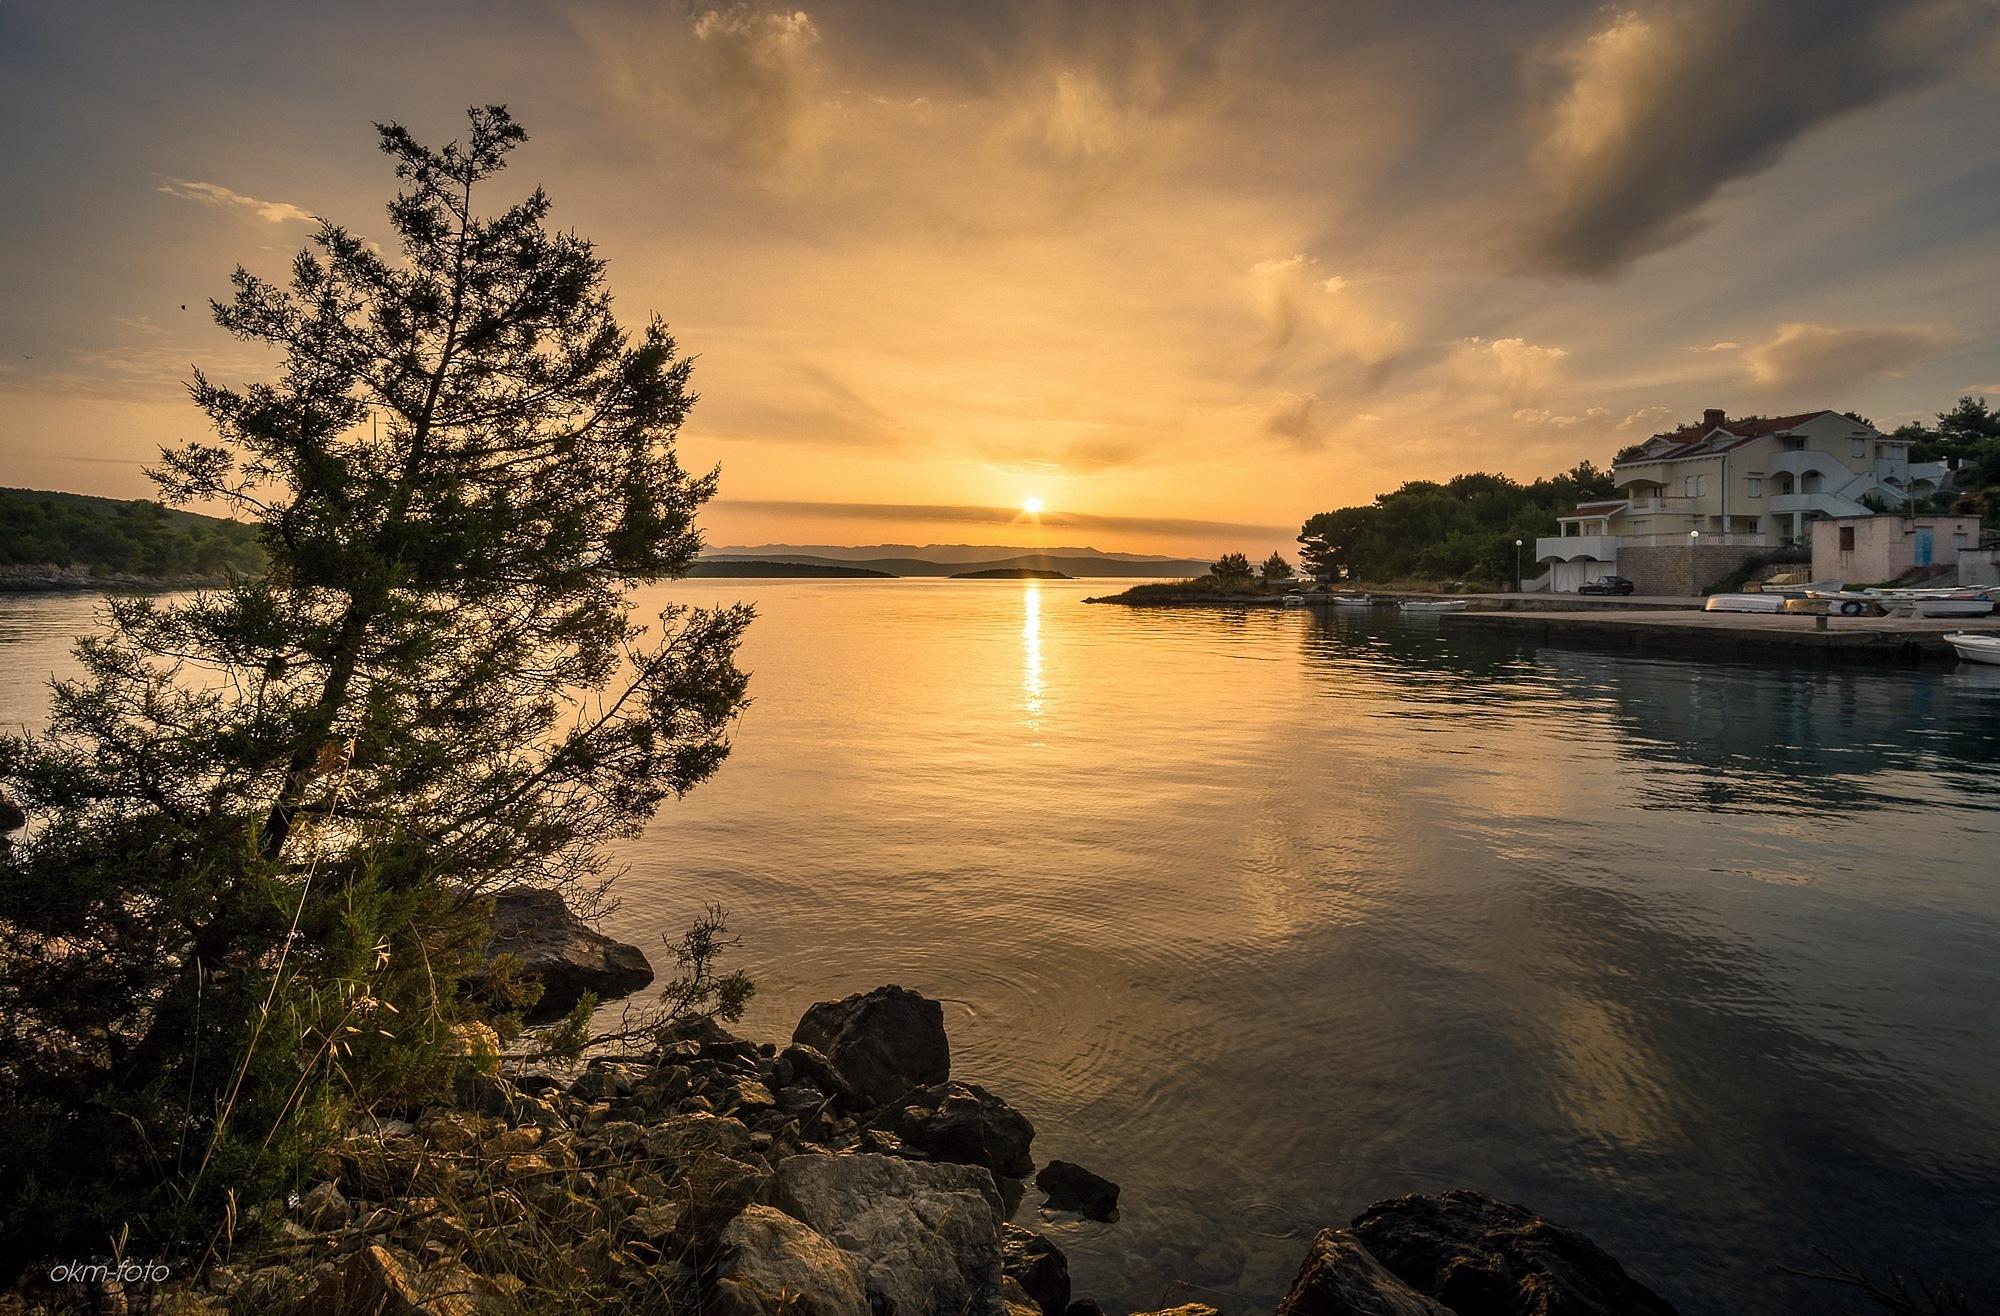 Sunrise Dragove by Oleg Muehlberger